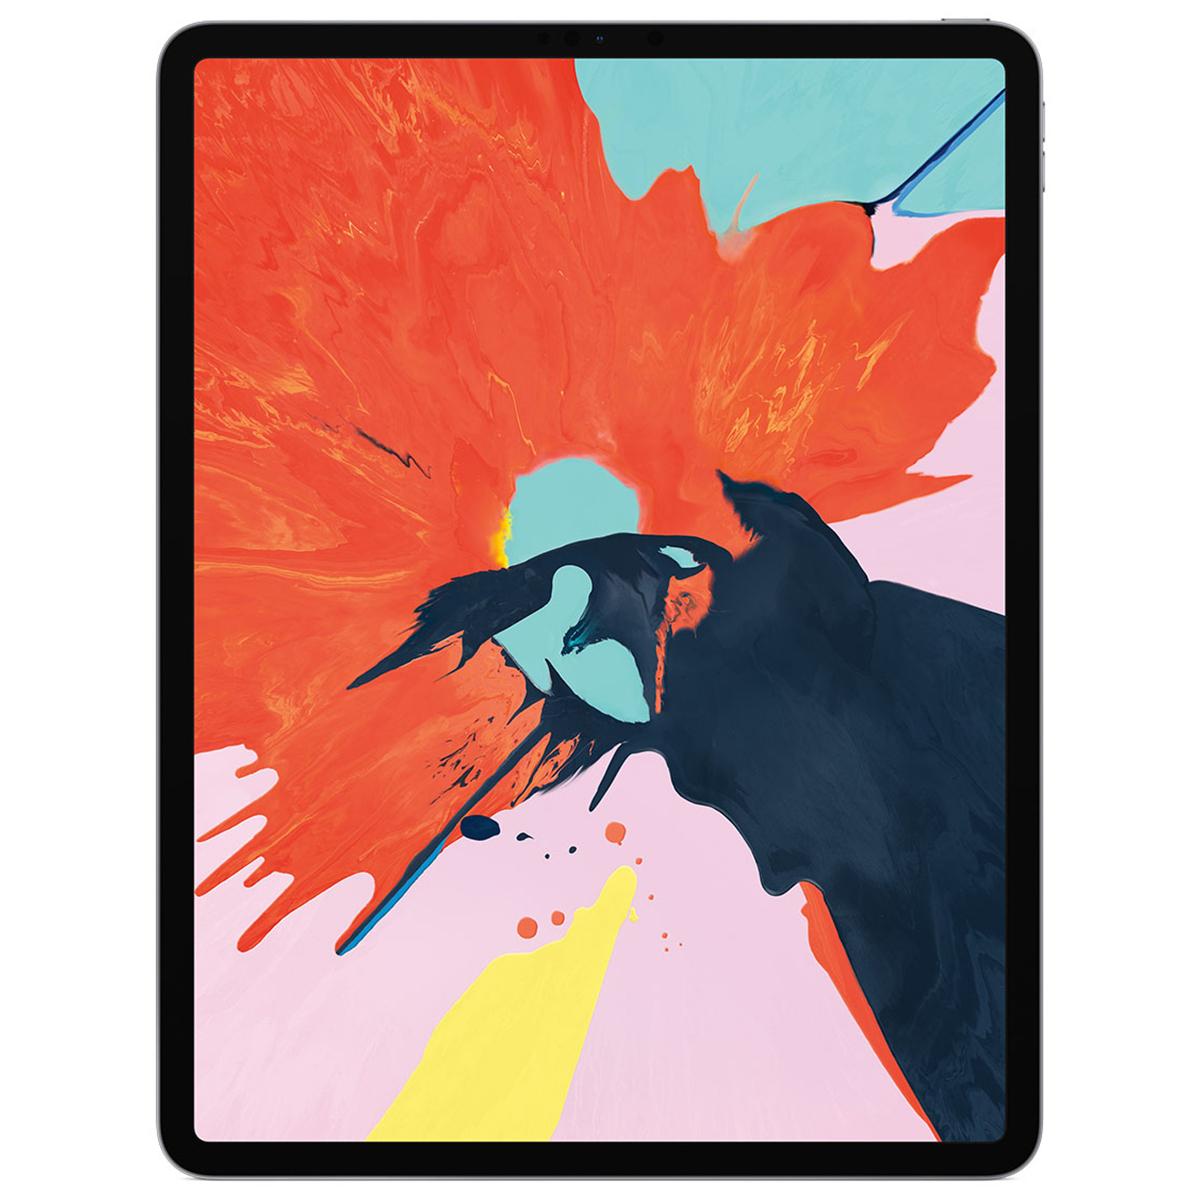 OfficeDepot: iPad Pro Apple MTEL2LZ/A / 12.9 Pulg. / 64gb / Chip A12X Bionic / iOS 12 / Gris